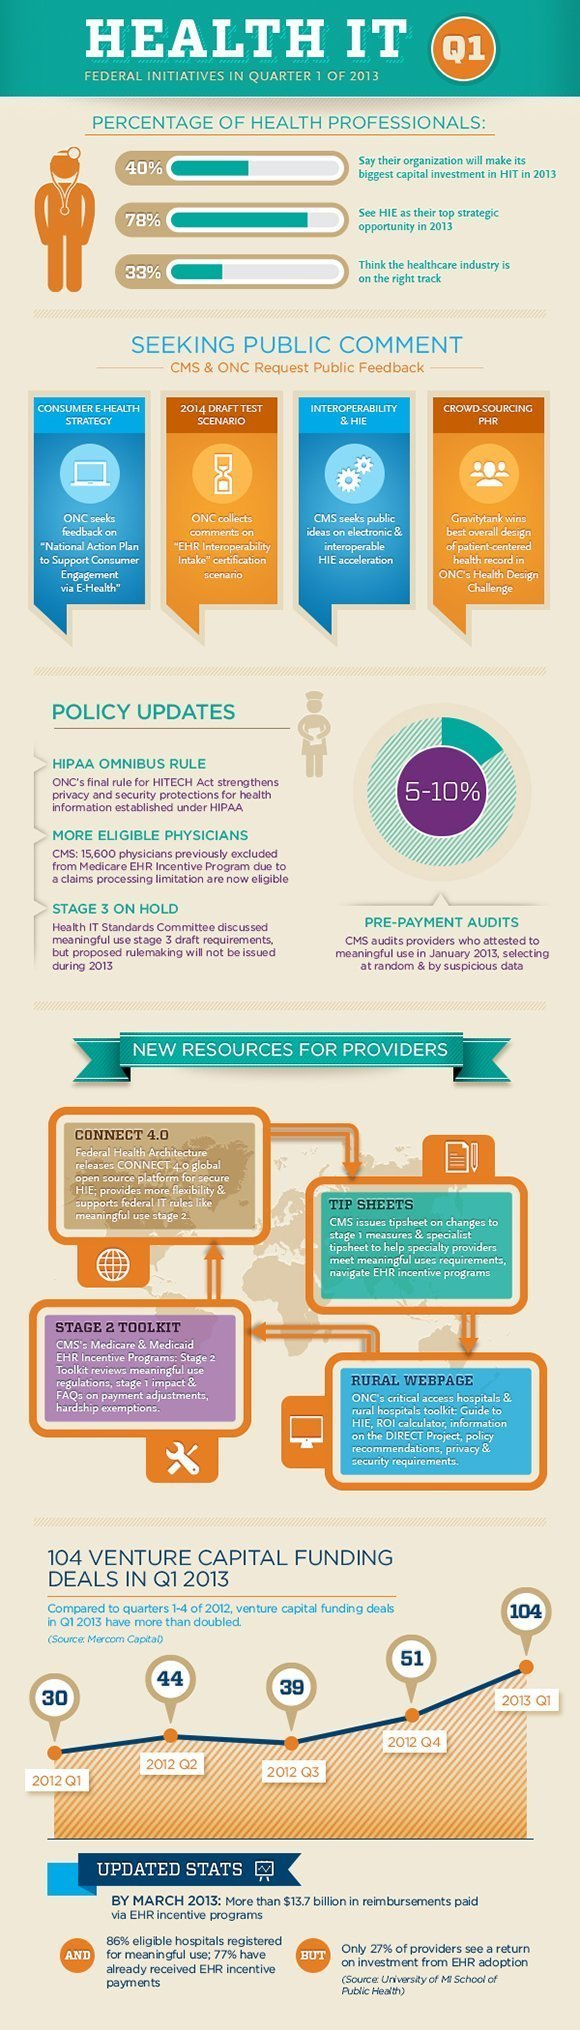 Federal Health IT initiatives 2013